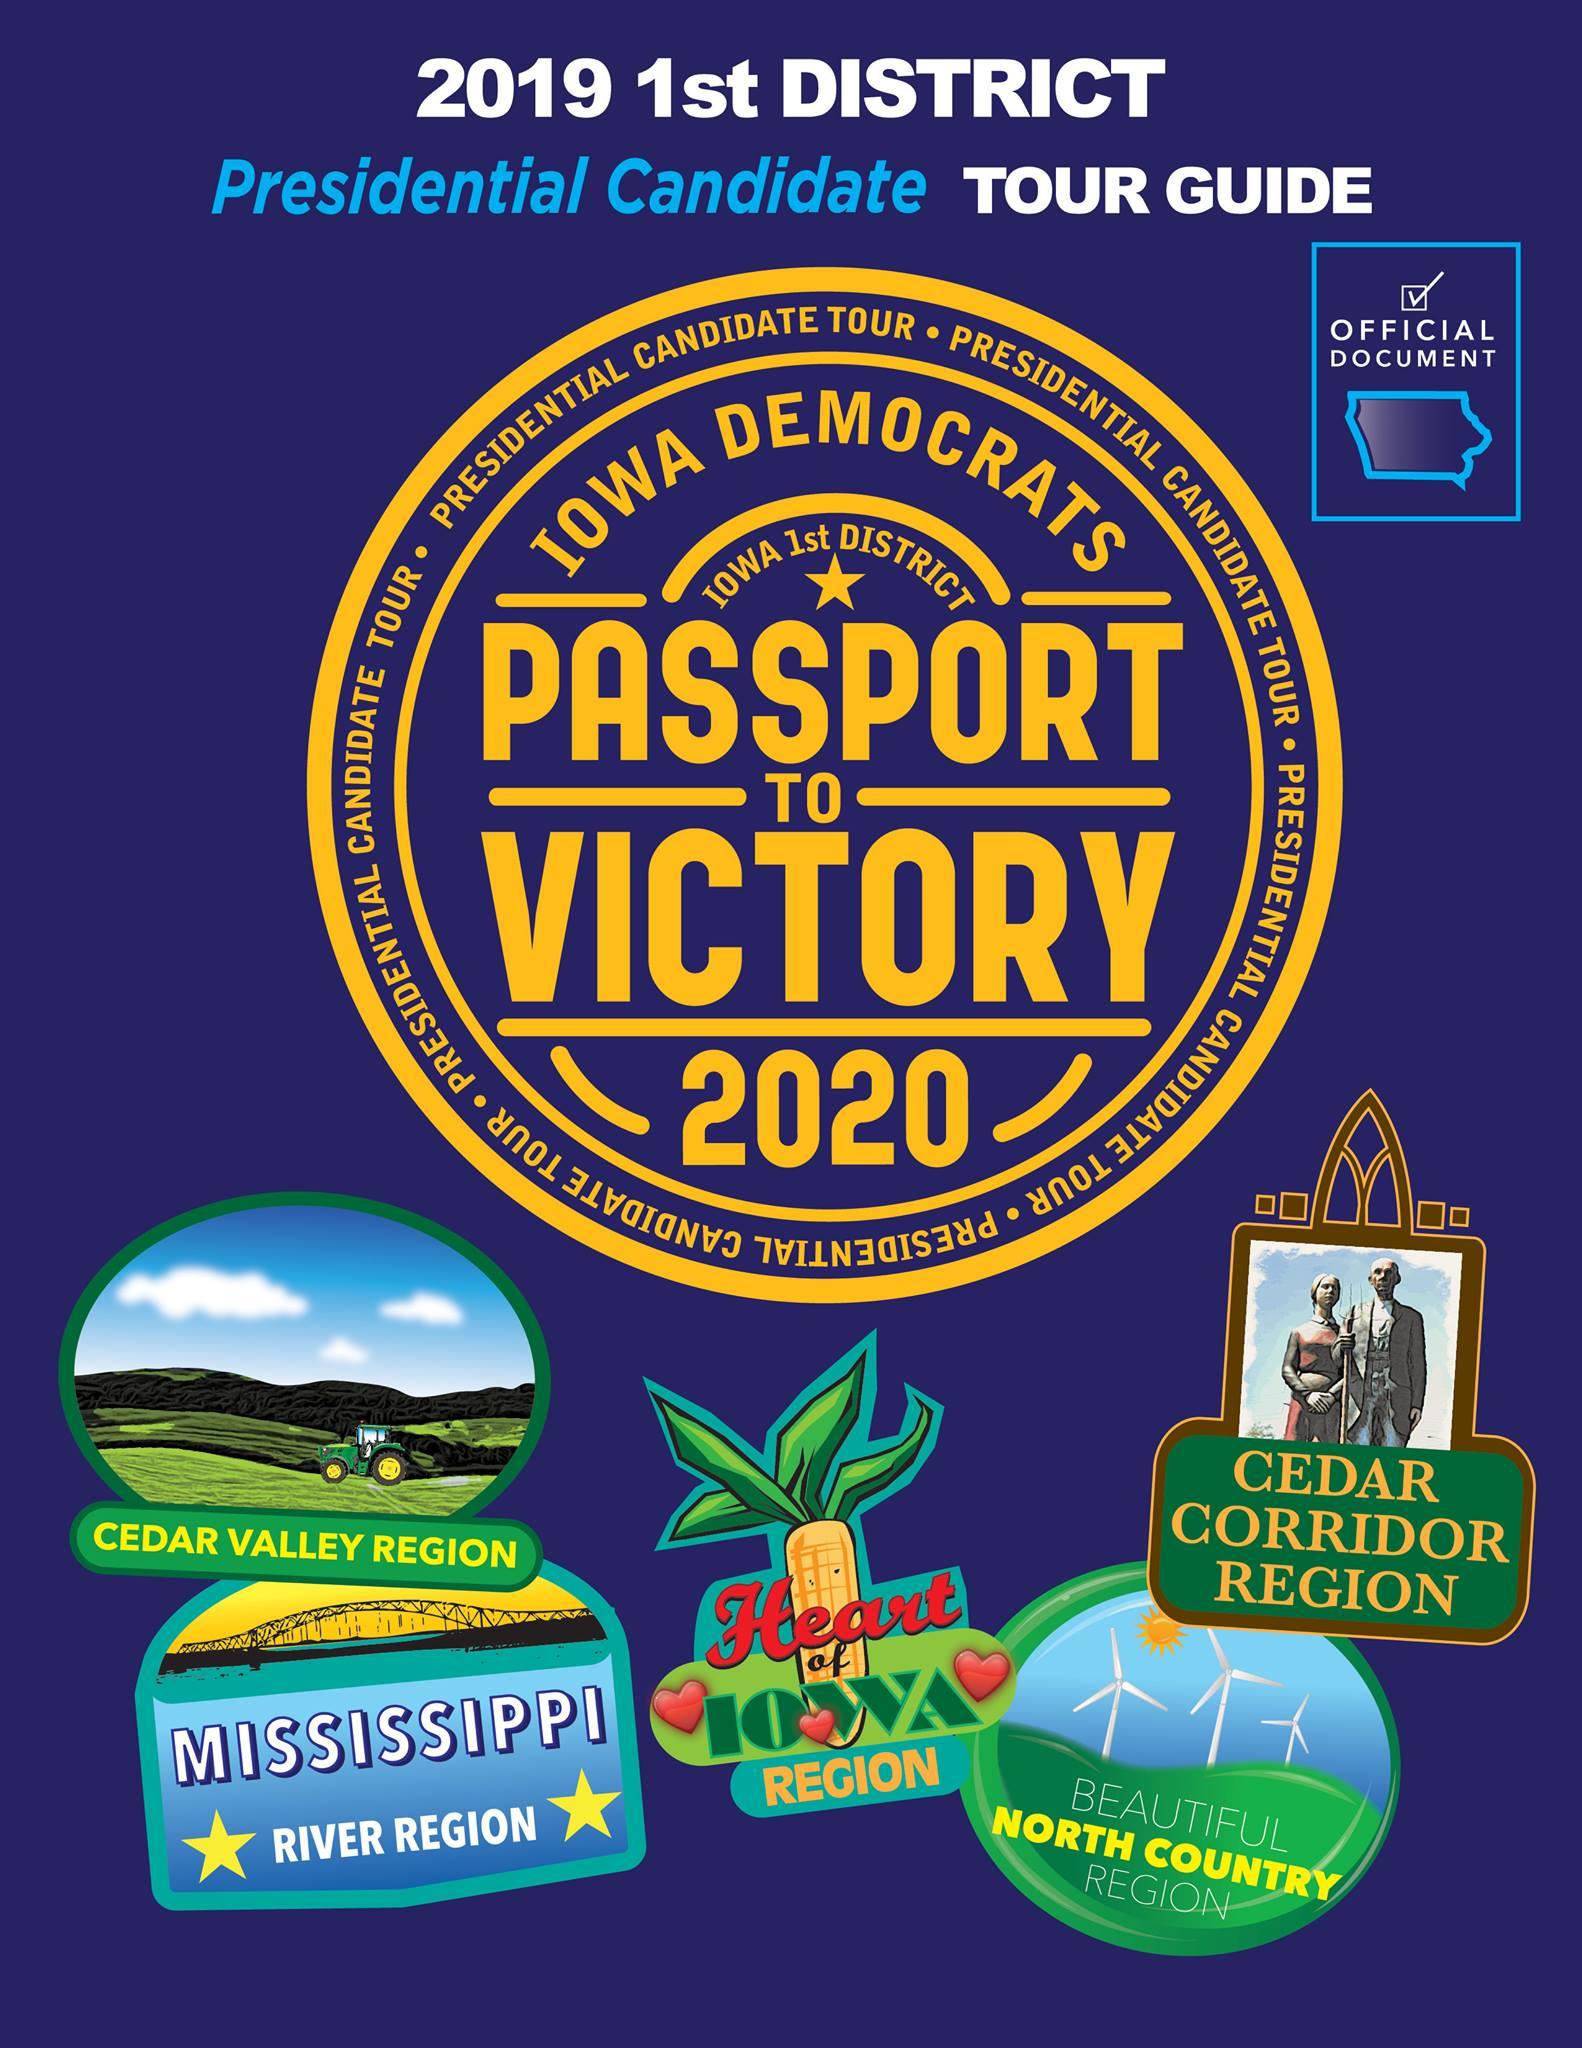 passport2victory.jpg